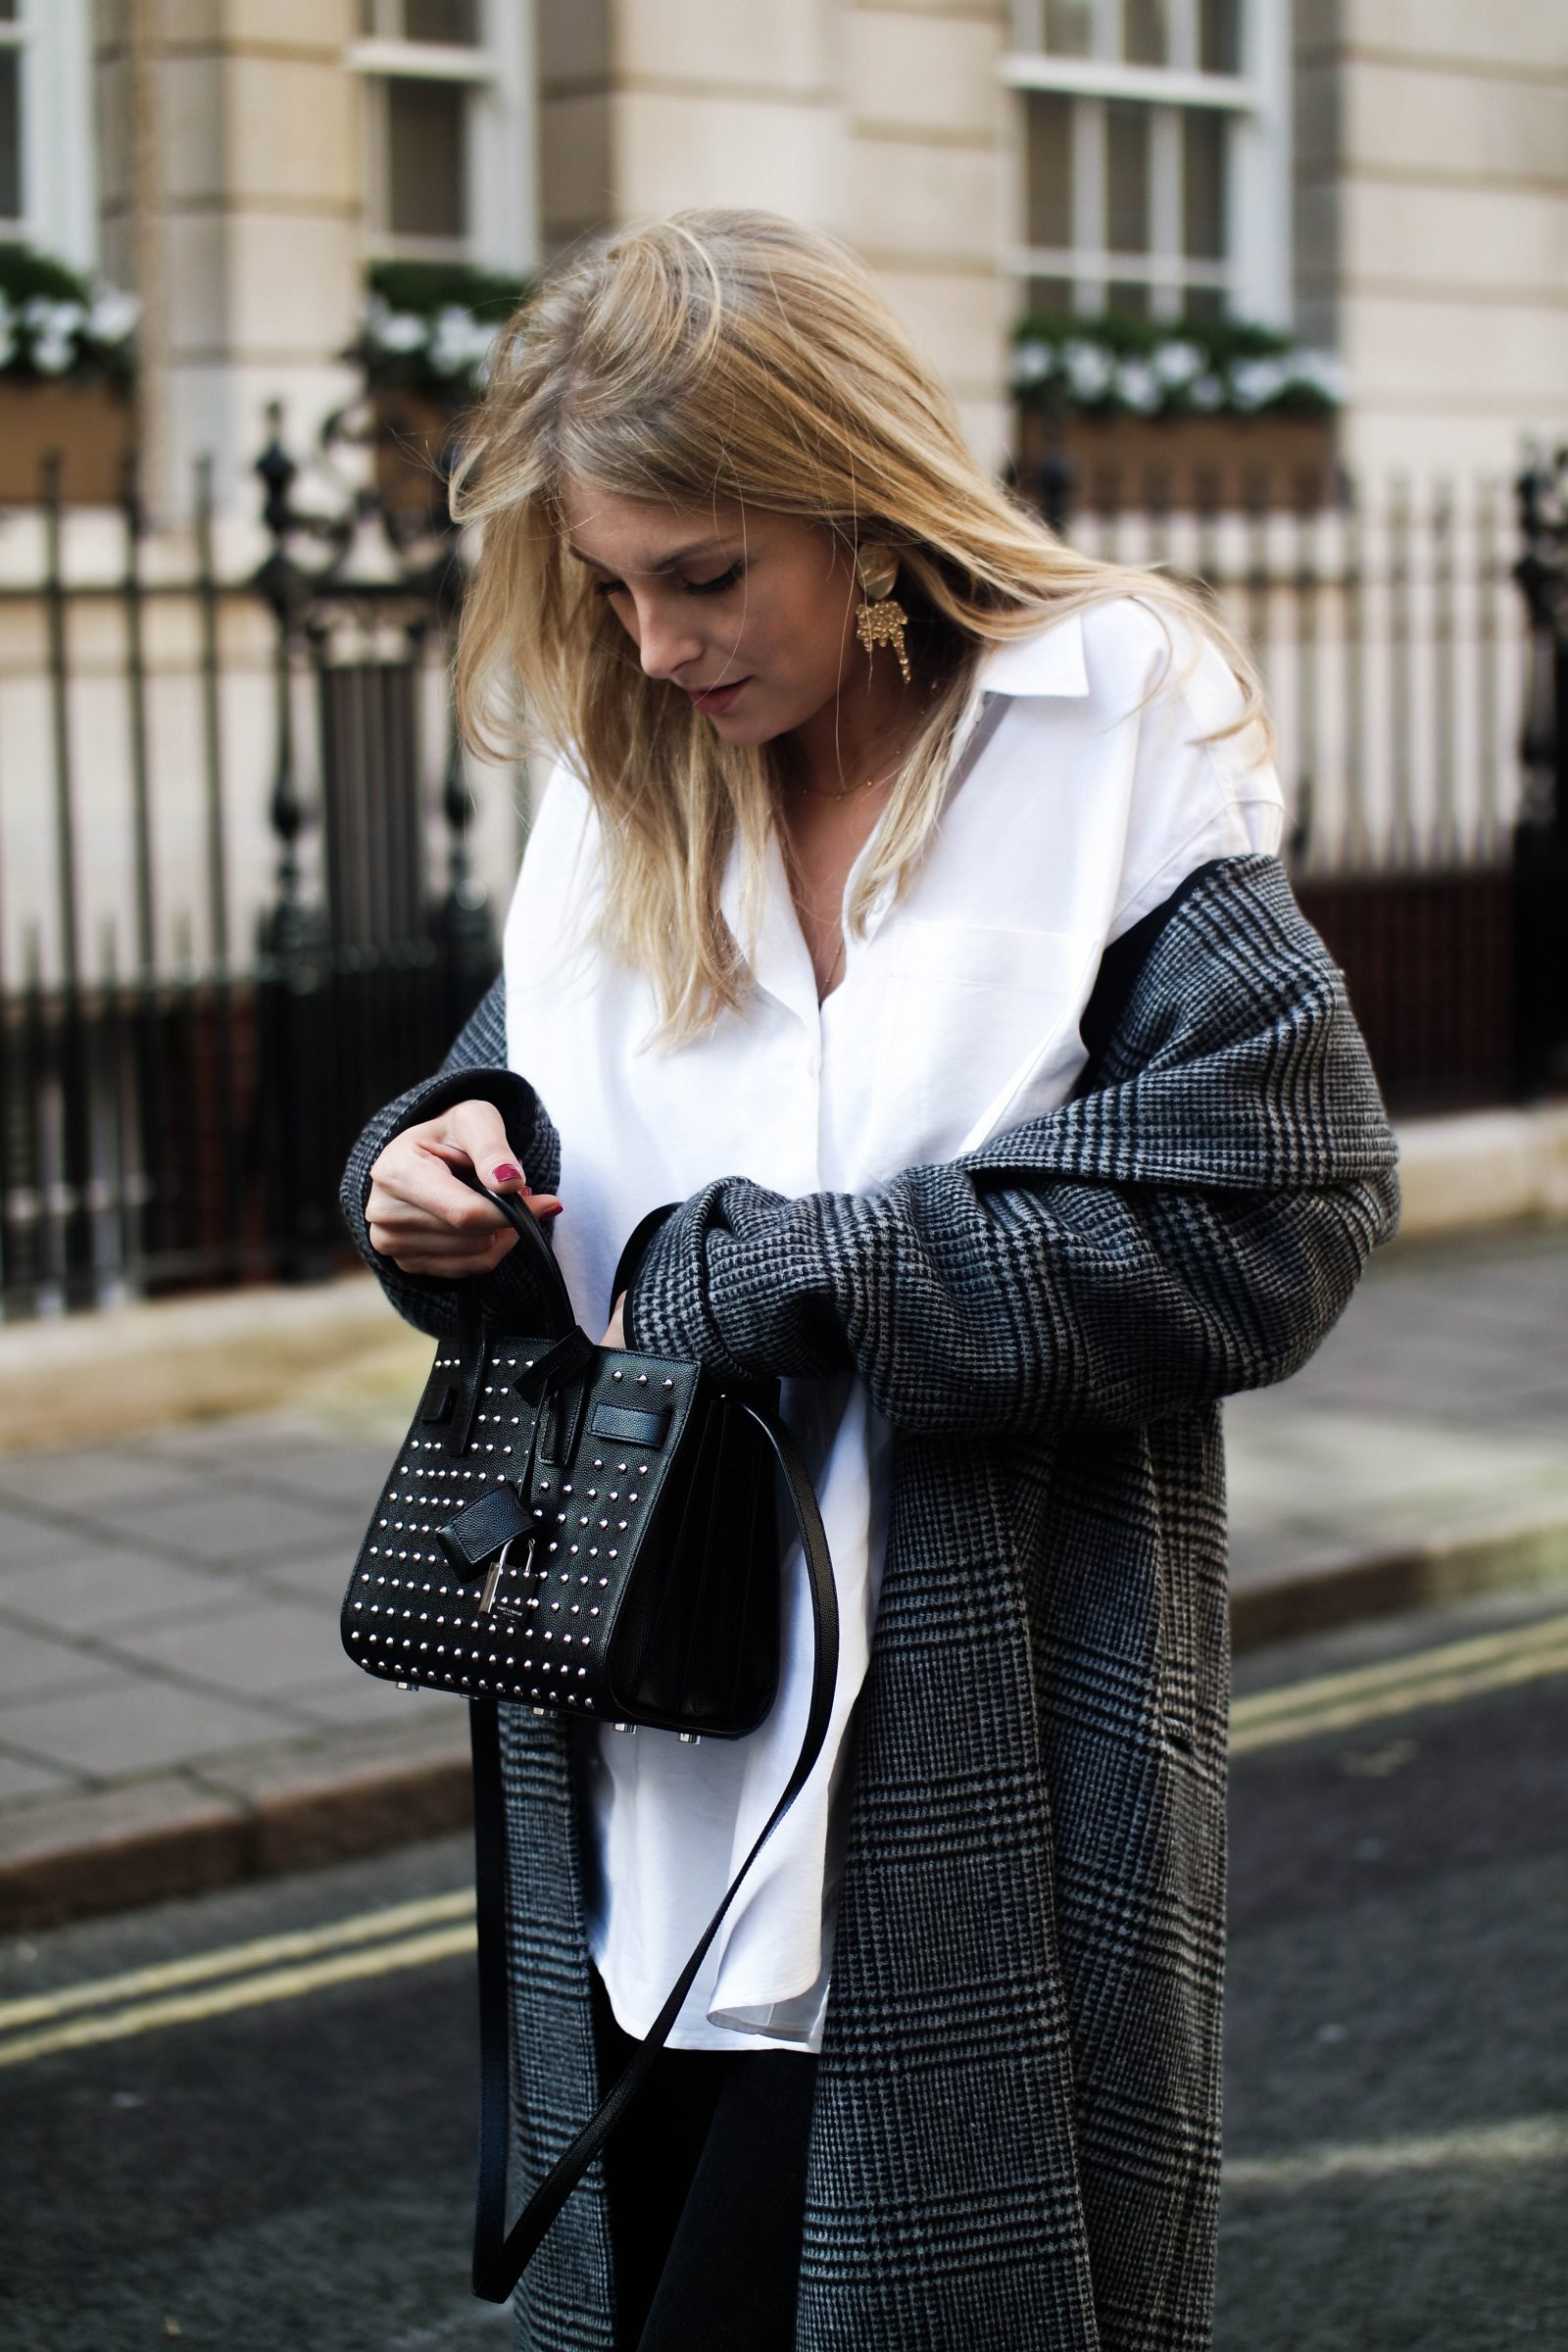 LFW Day 3 Keeping It Monochrome - Blogger Street Style